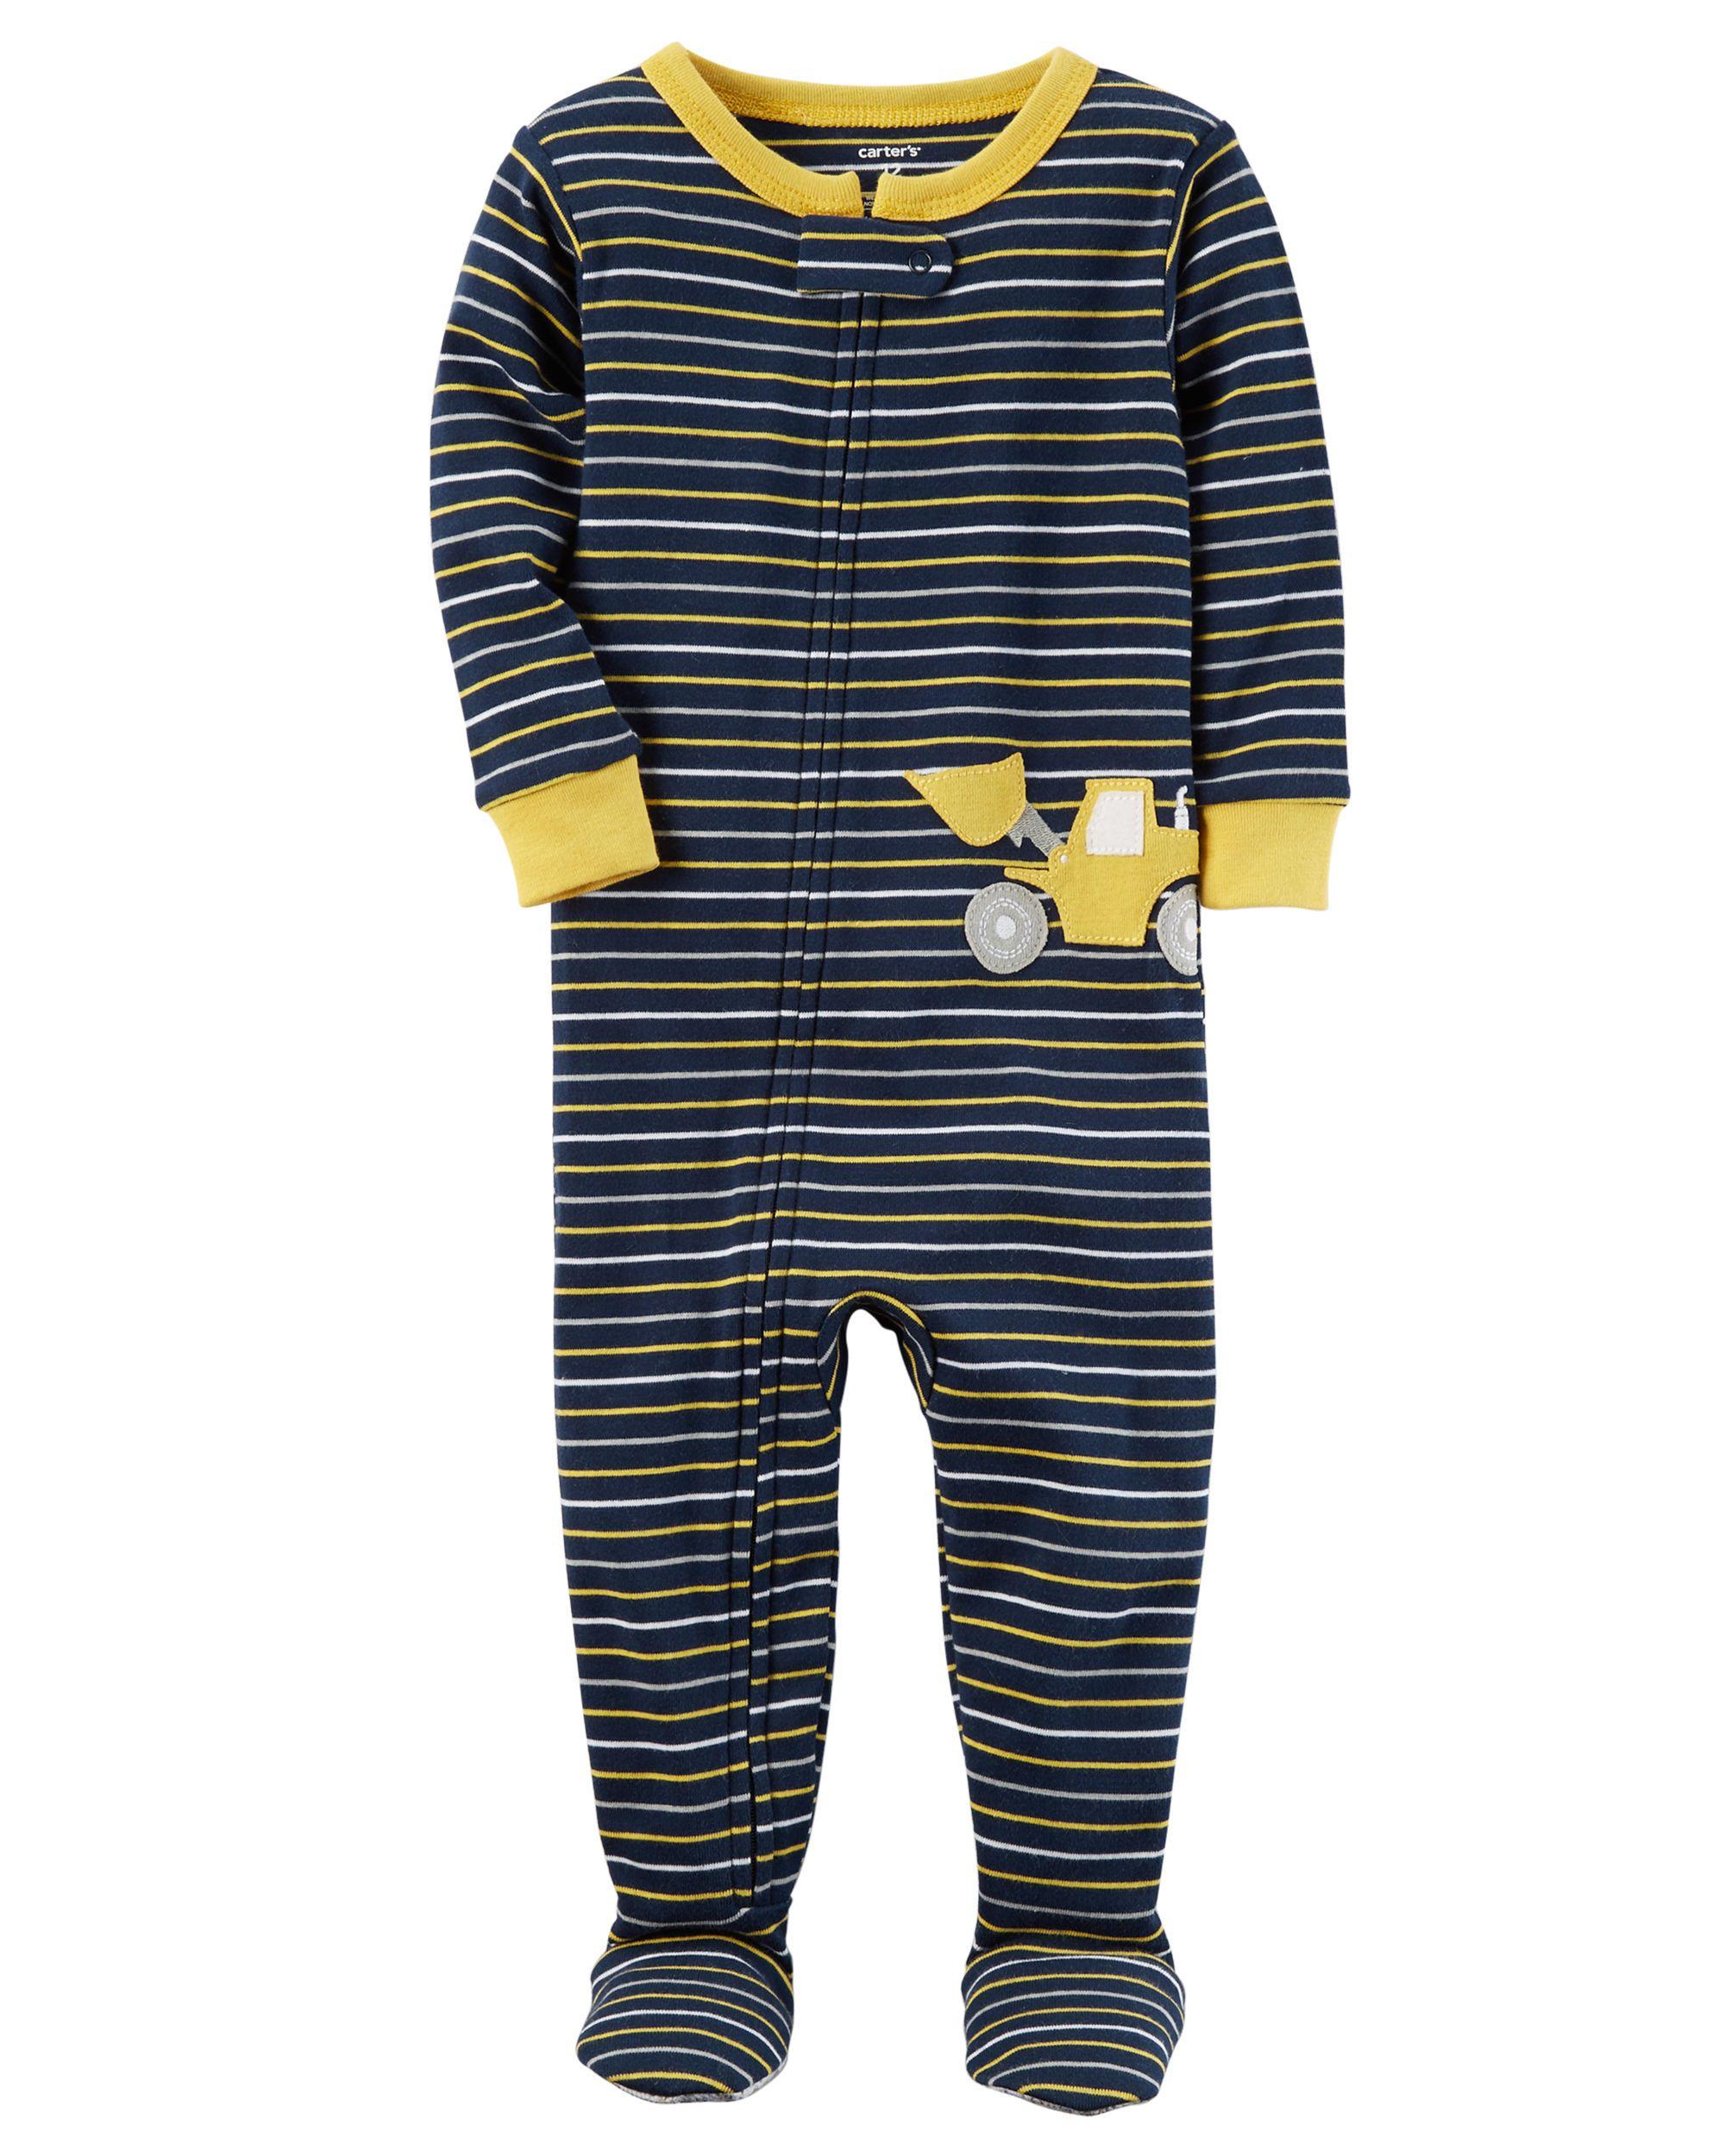 1 Piece Jersey PJs clothes ideas for Nikolas Pinterest